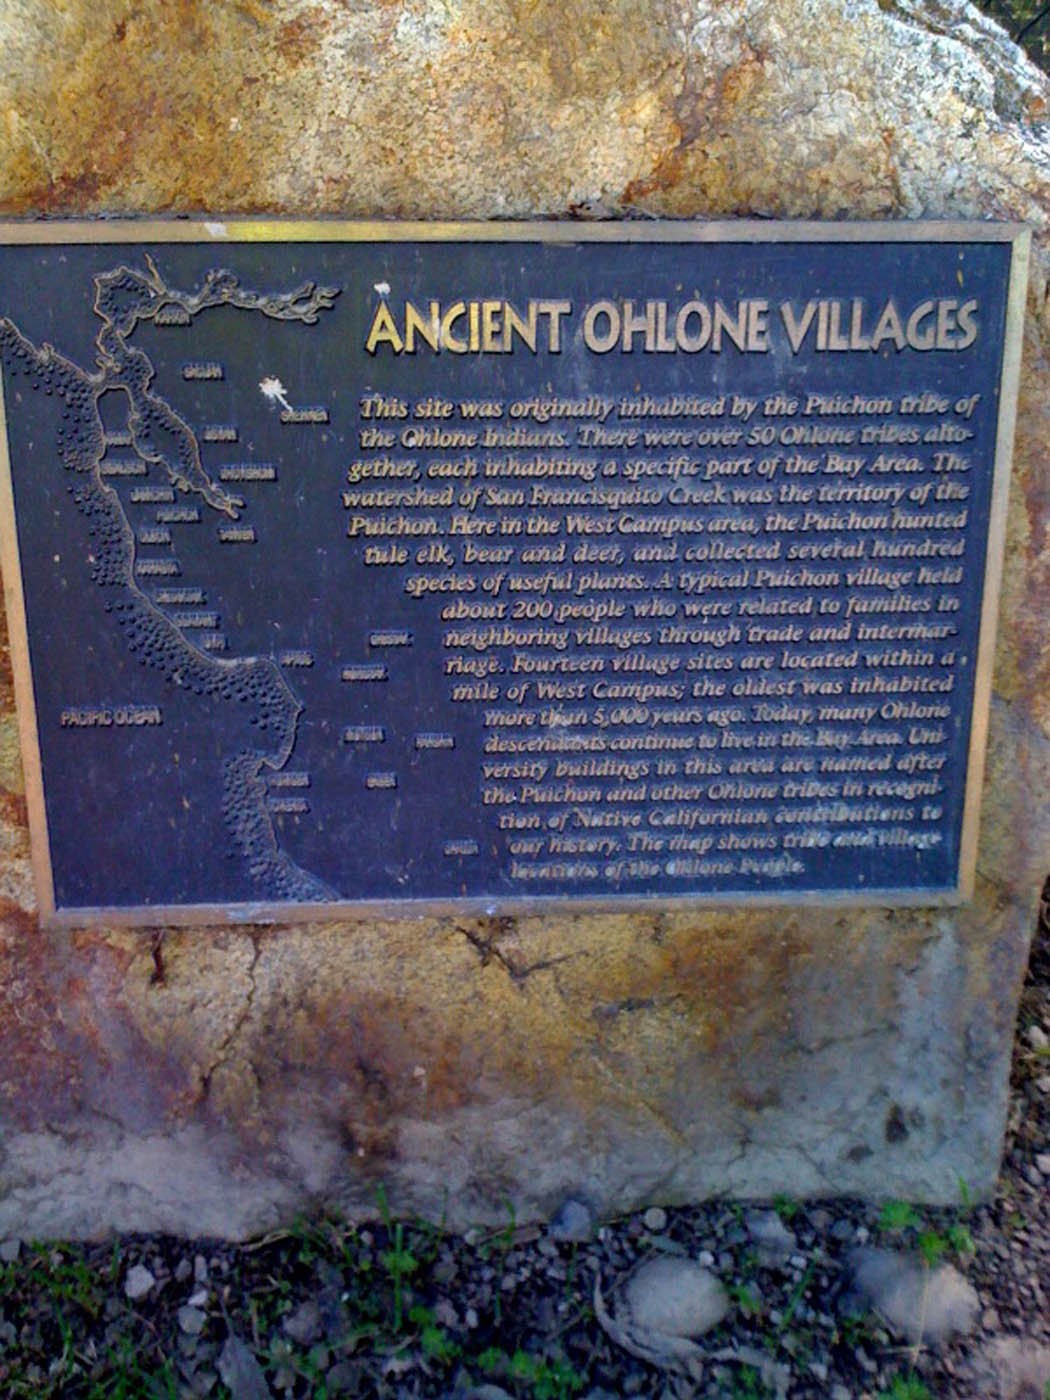 Ohlone villages_web.jpg